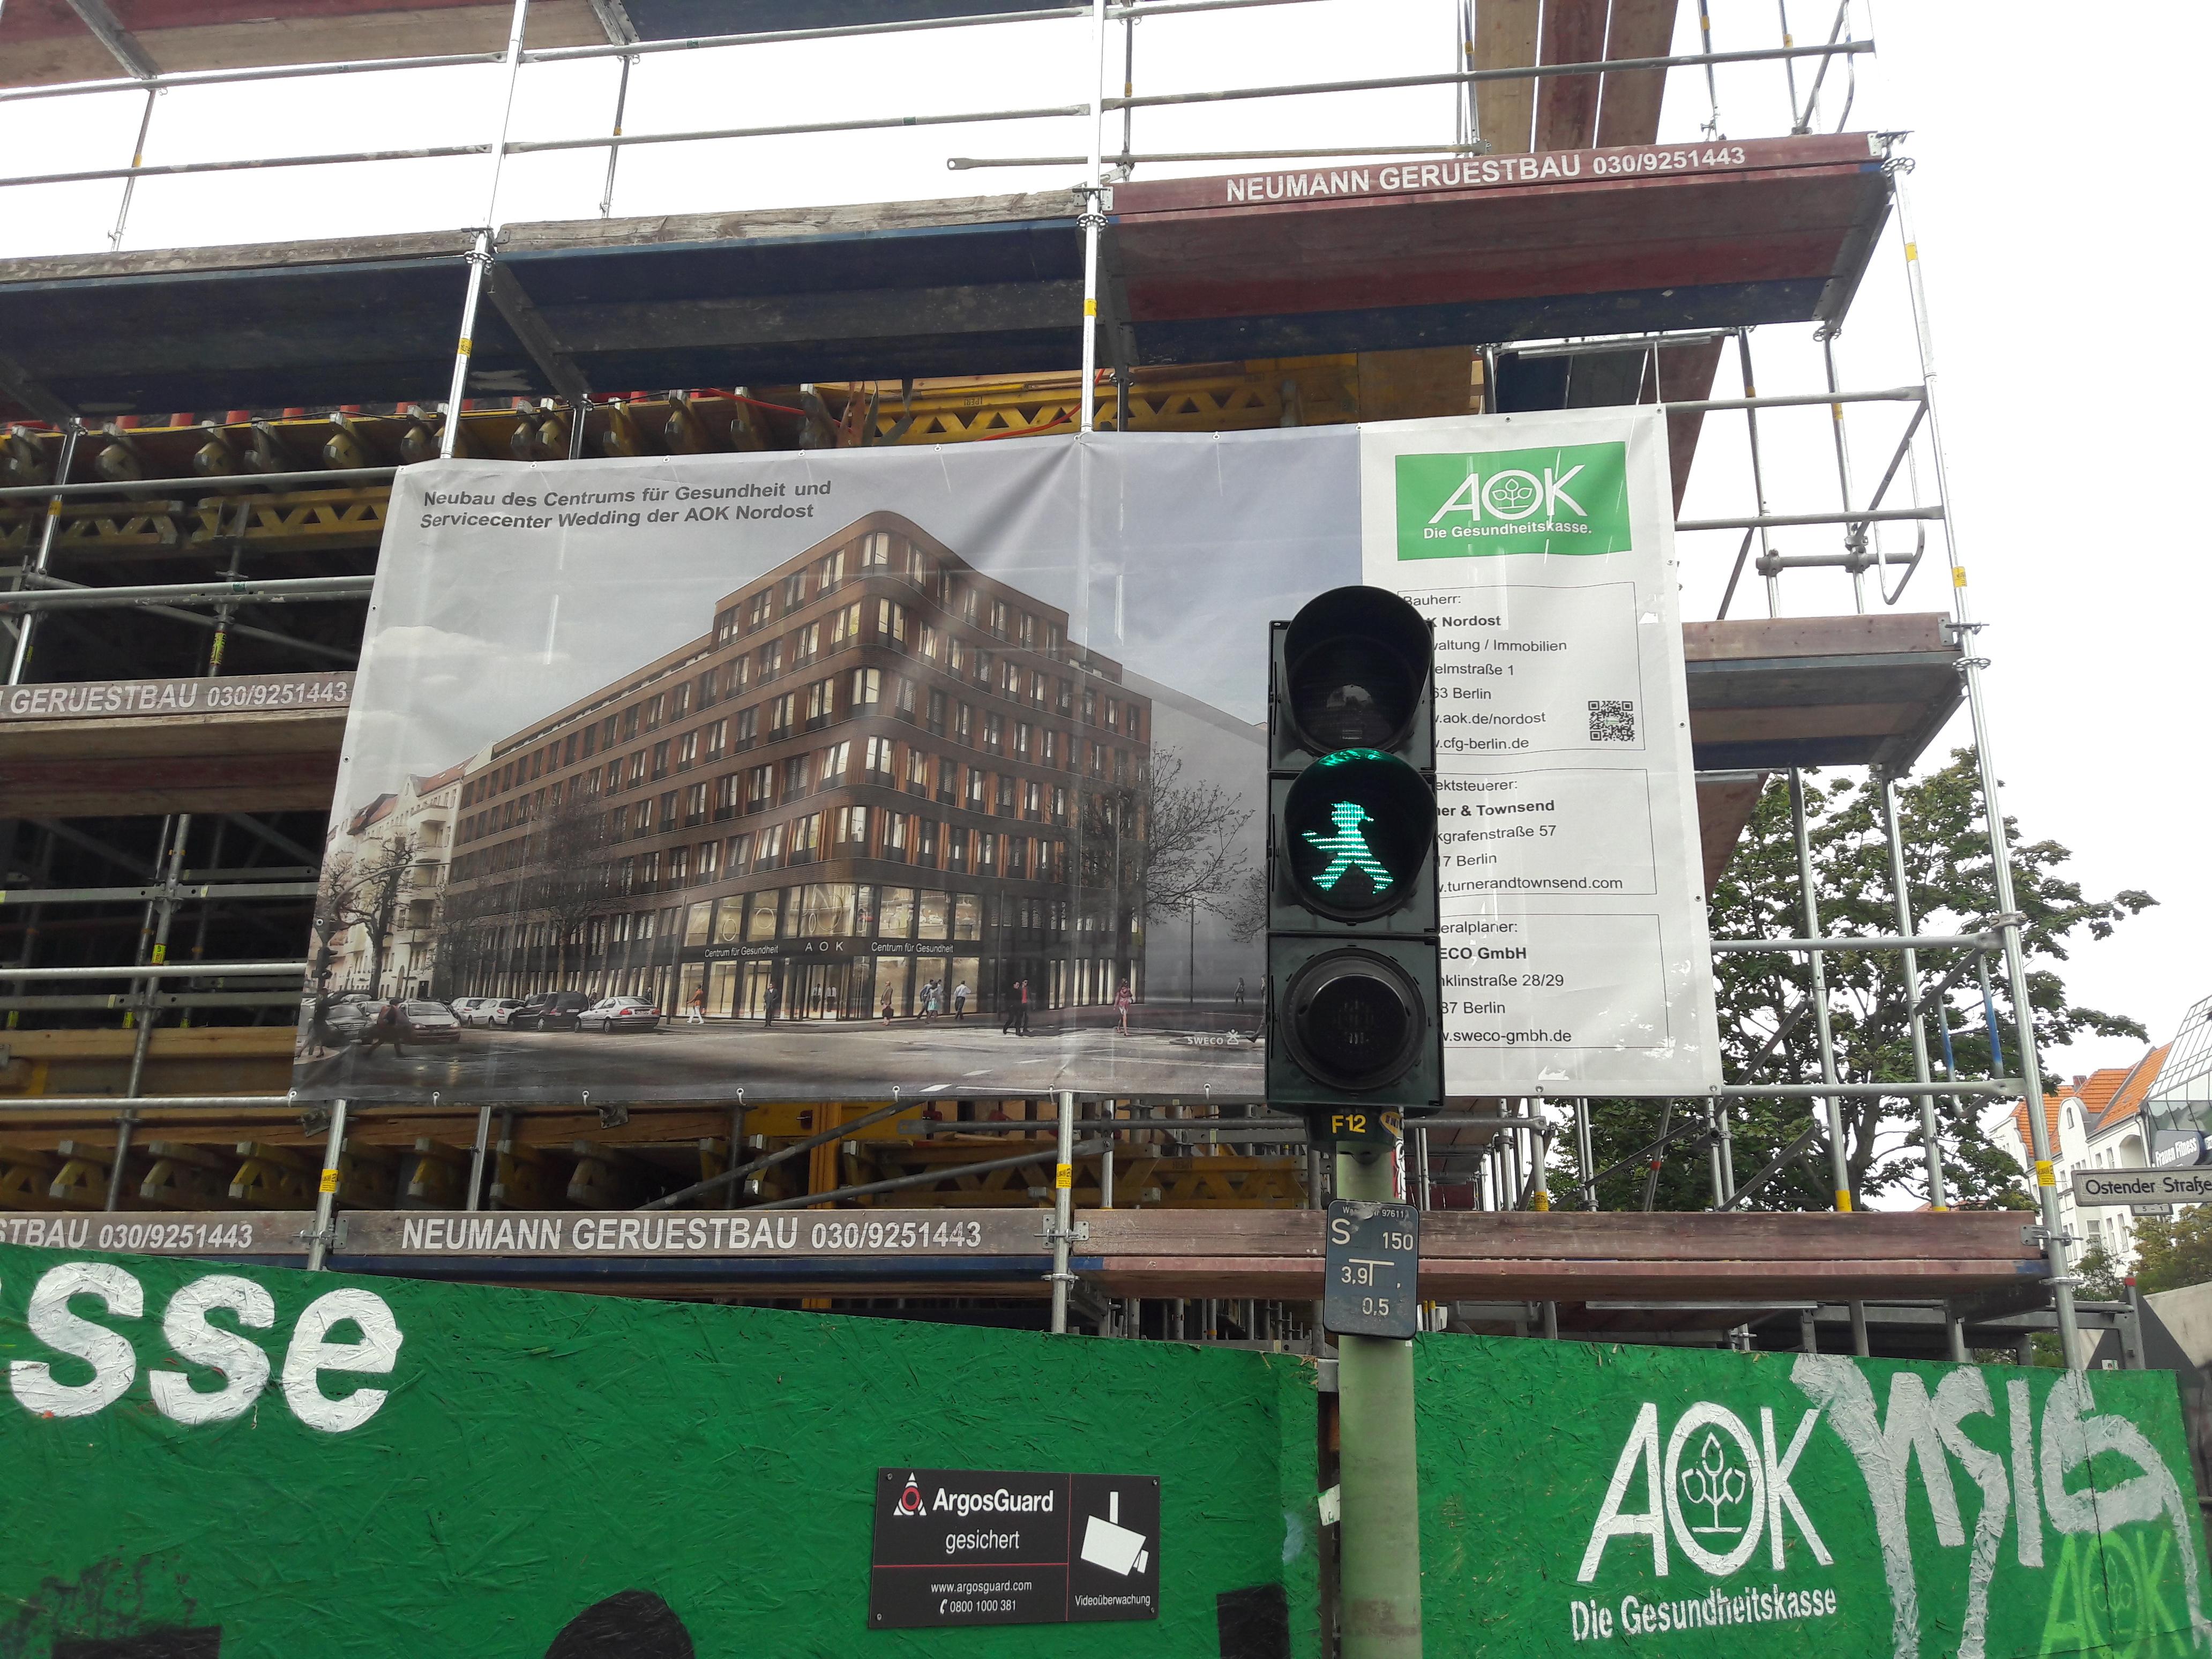 AOK-Neubau-Bauschild.jpg